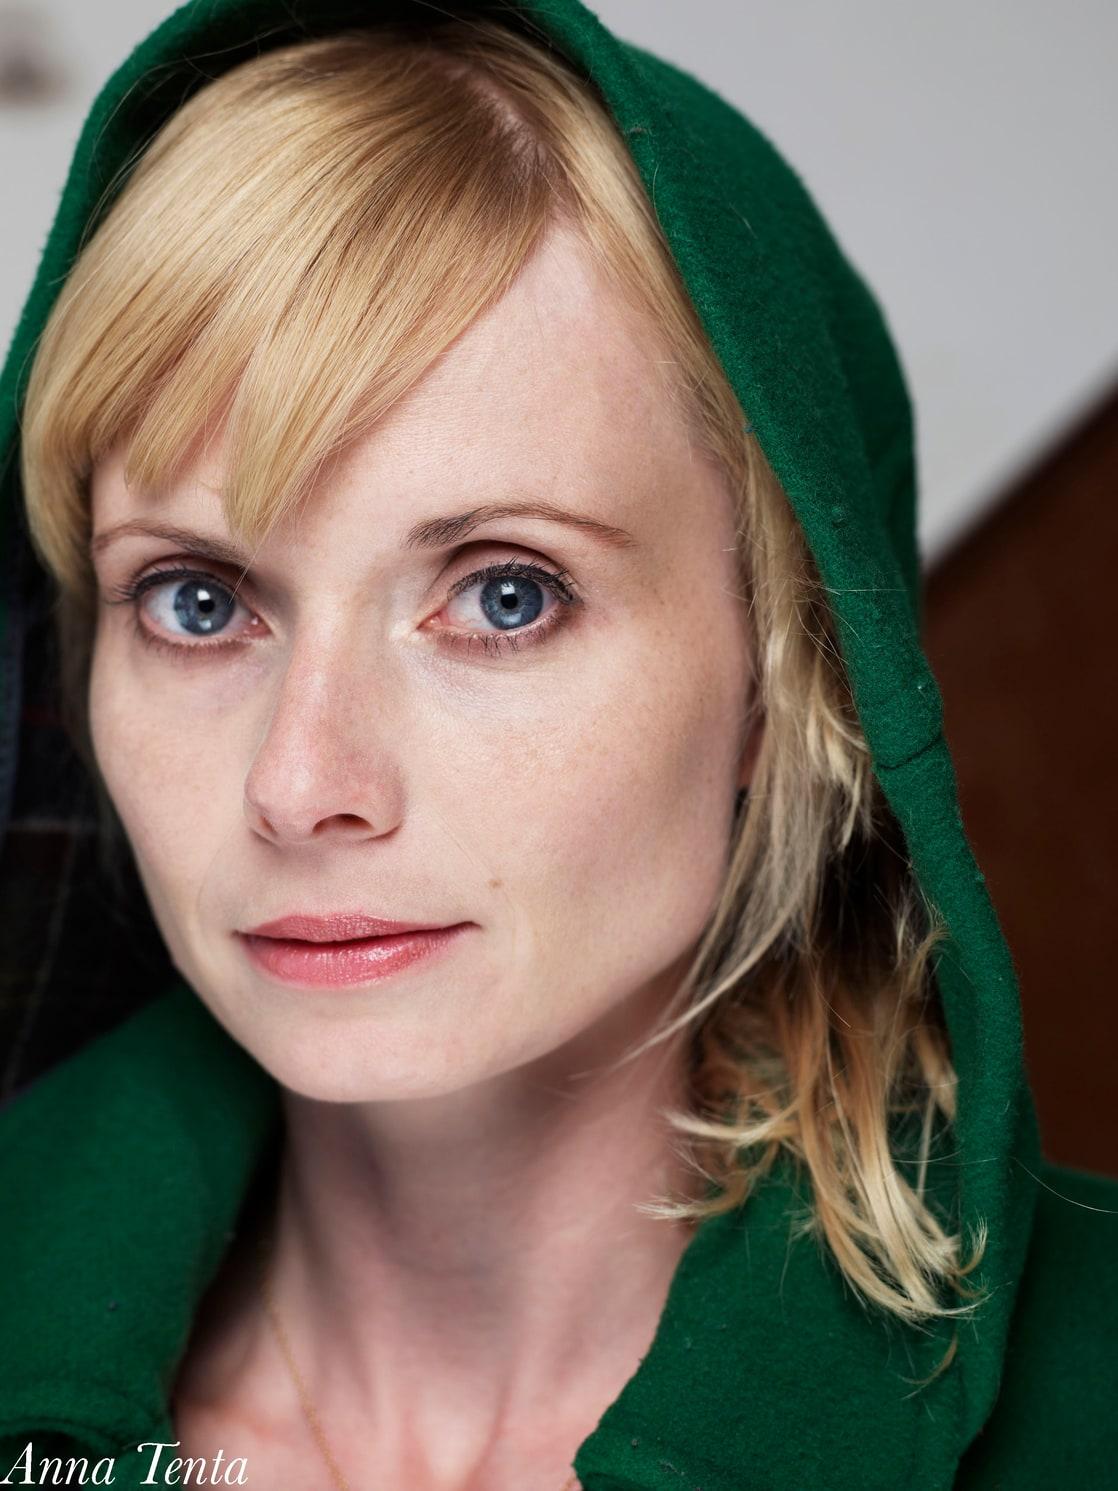 Anna Tenta nude 45